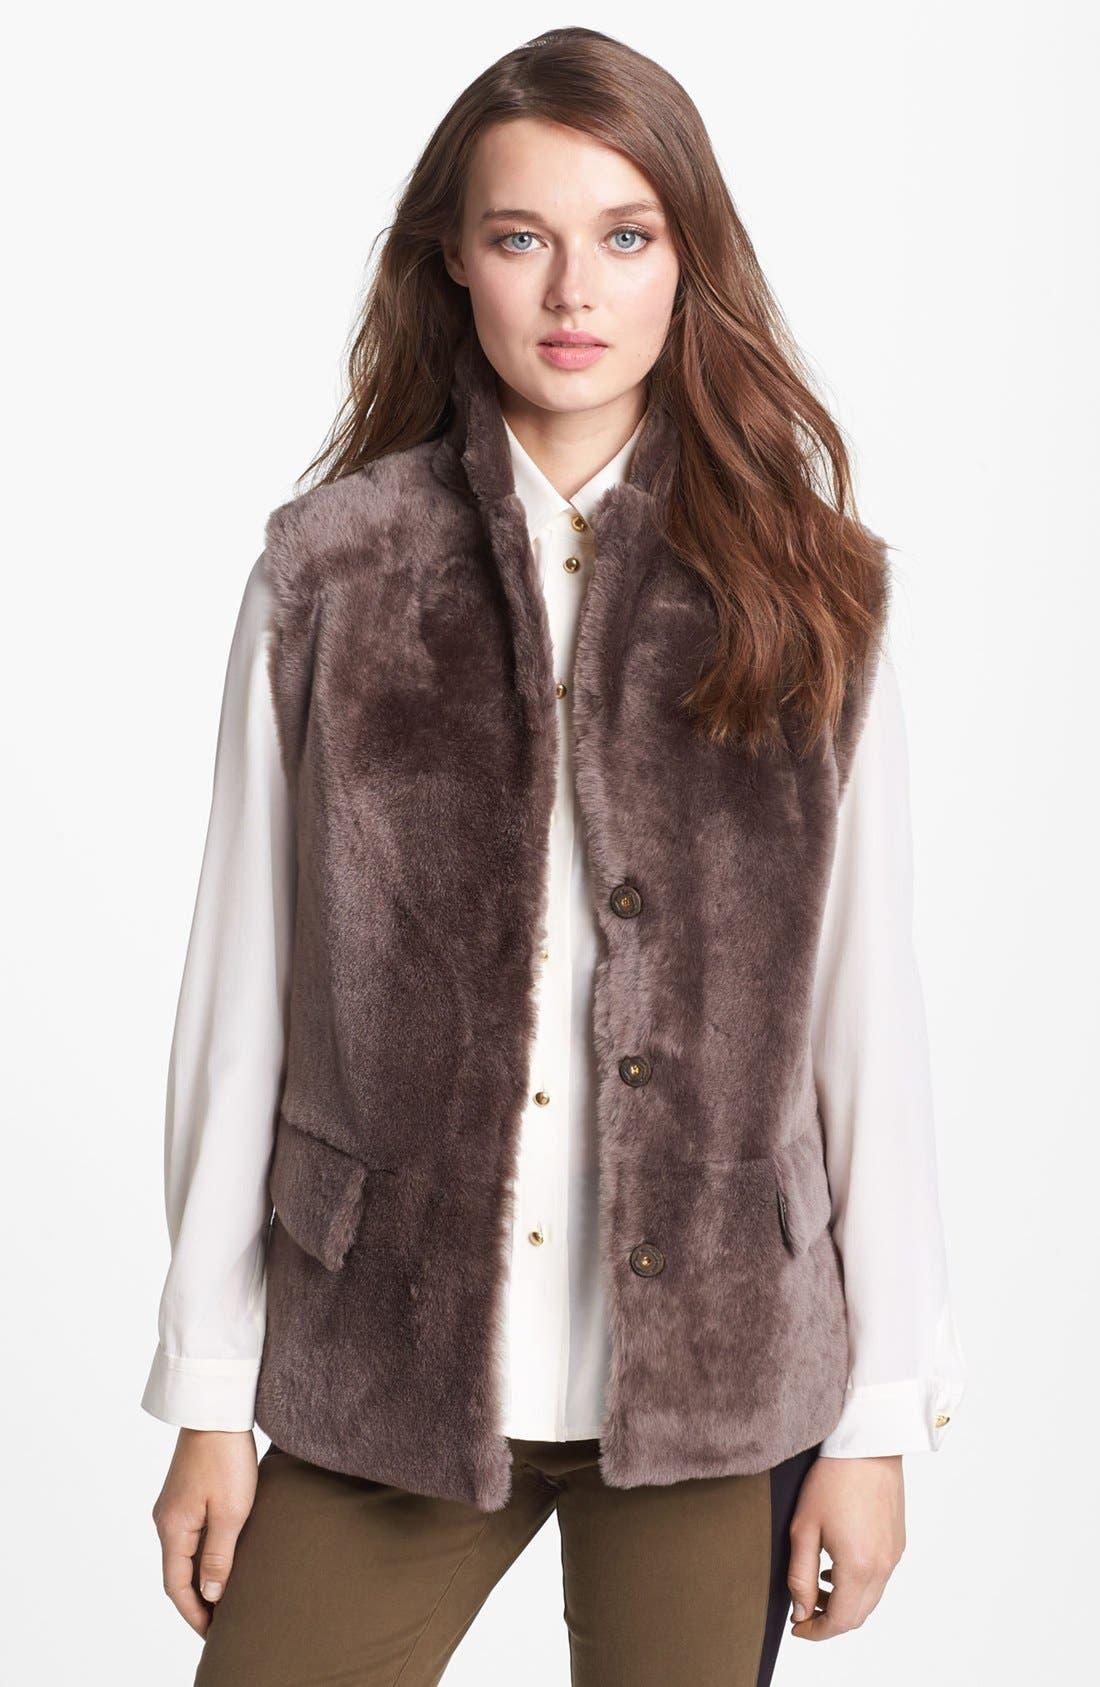 Alternate Image 1 Selected - MARC BY MARC JACOBS 'Hudson' Genuine Shearling Vest